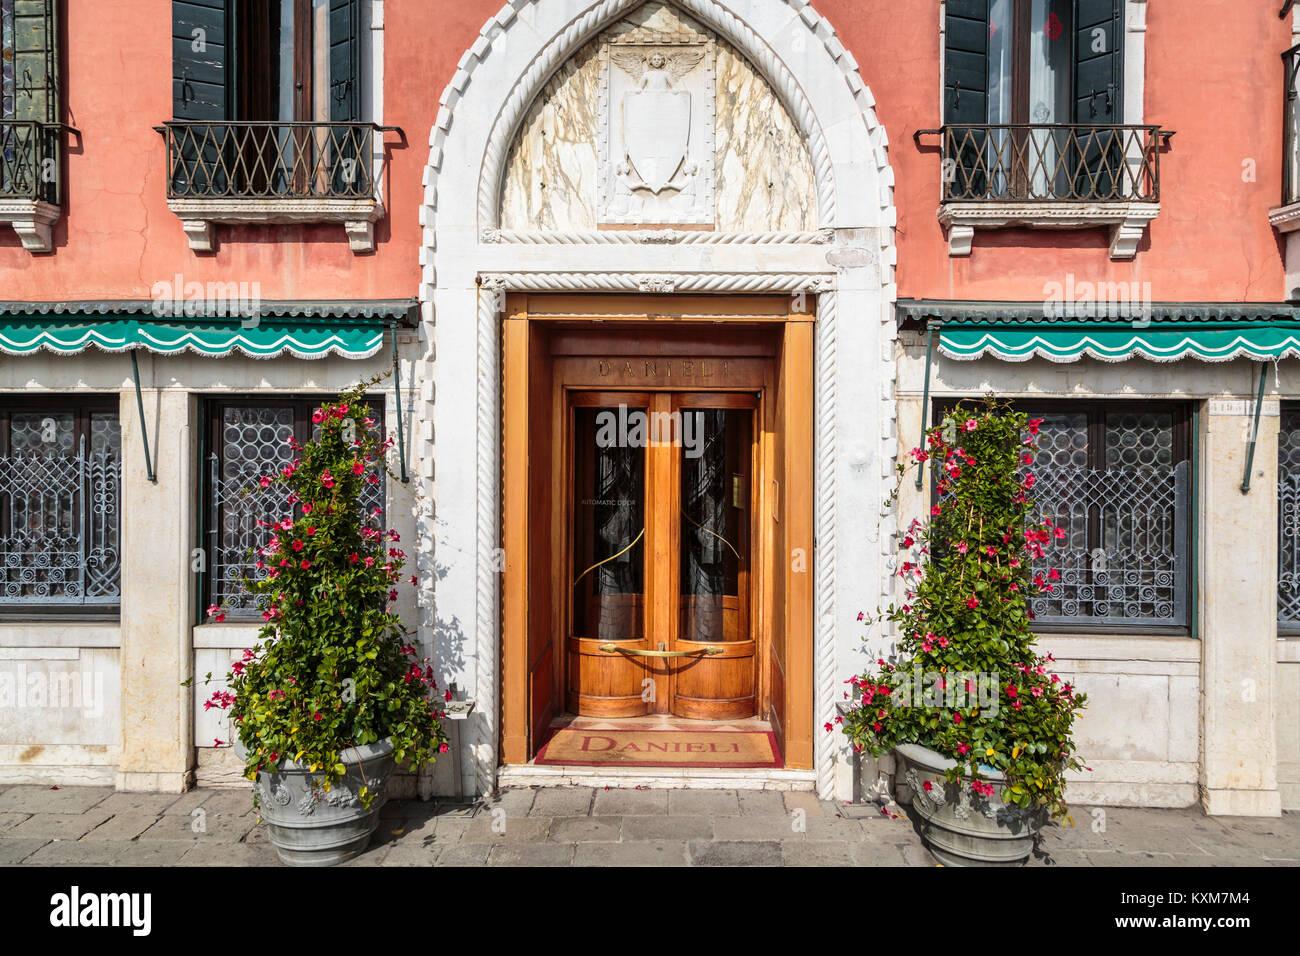 A restaurant entrance door in Veneto, Venice, Italy, Europe. - Stock Image